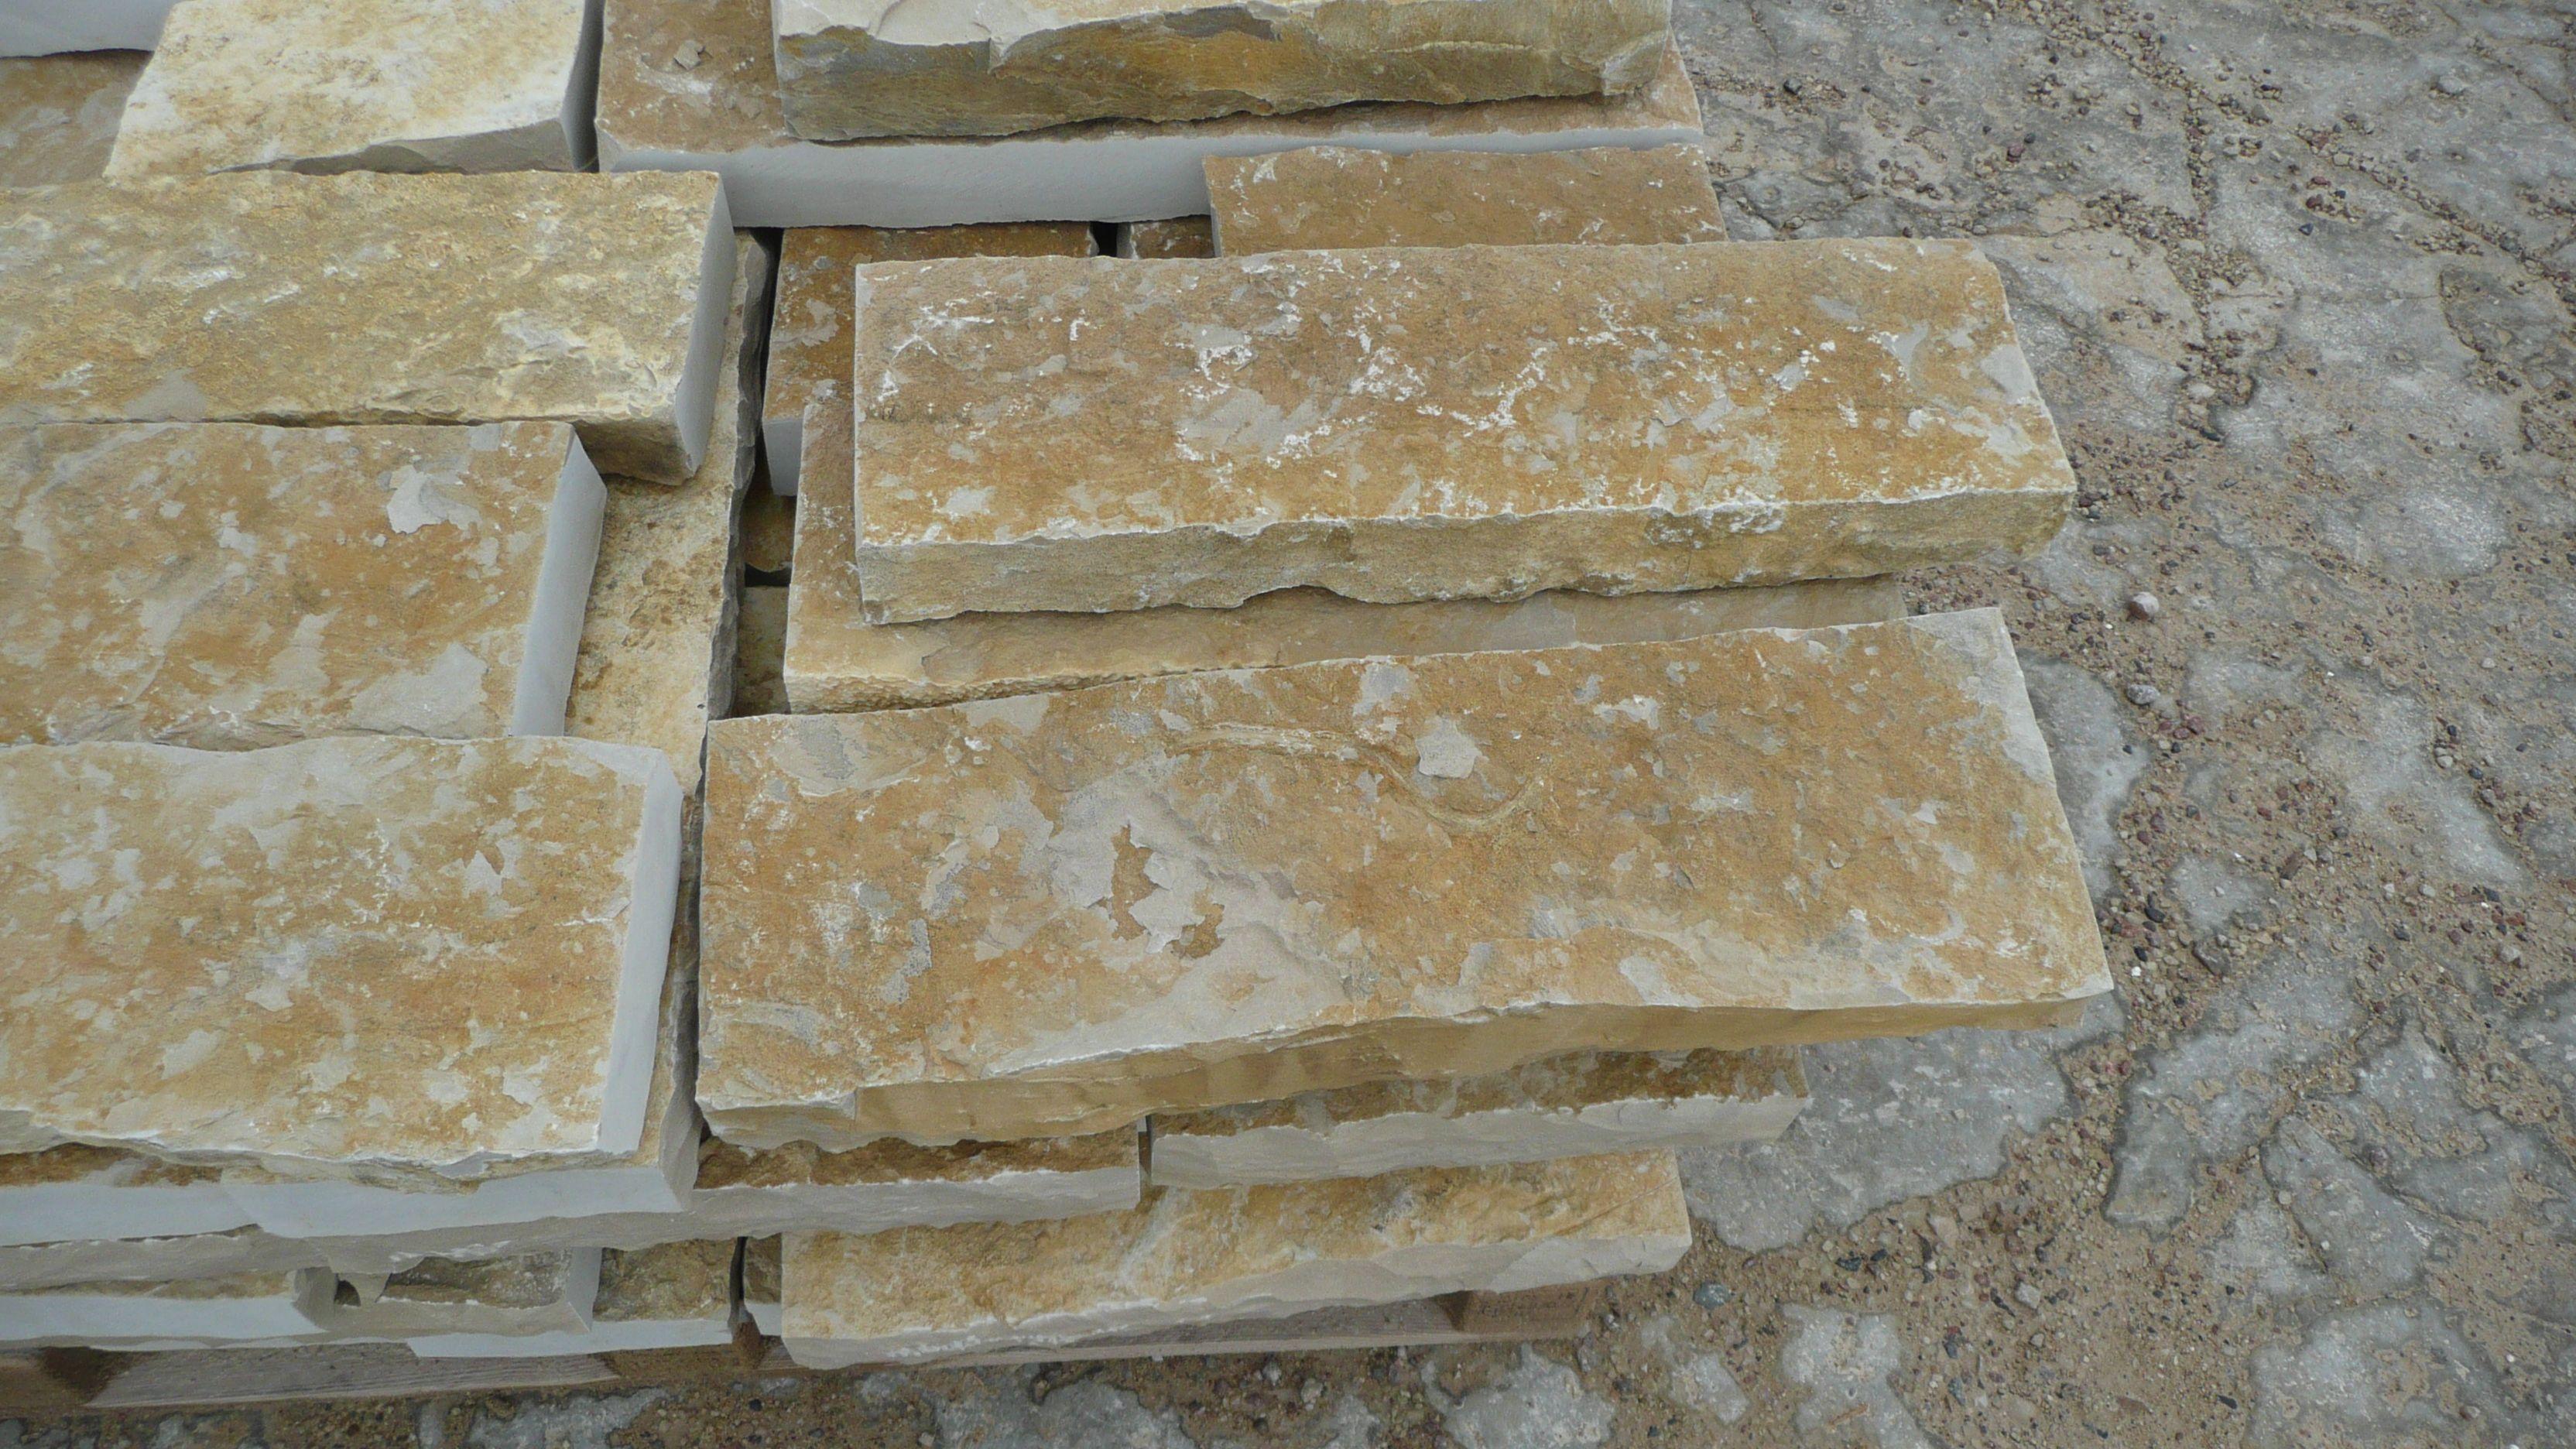 Pierre De L Yonne bordures en pierre de bourgogne yonne | pierre de bourgogne